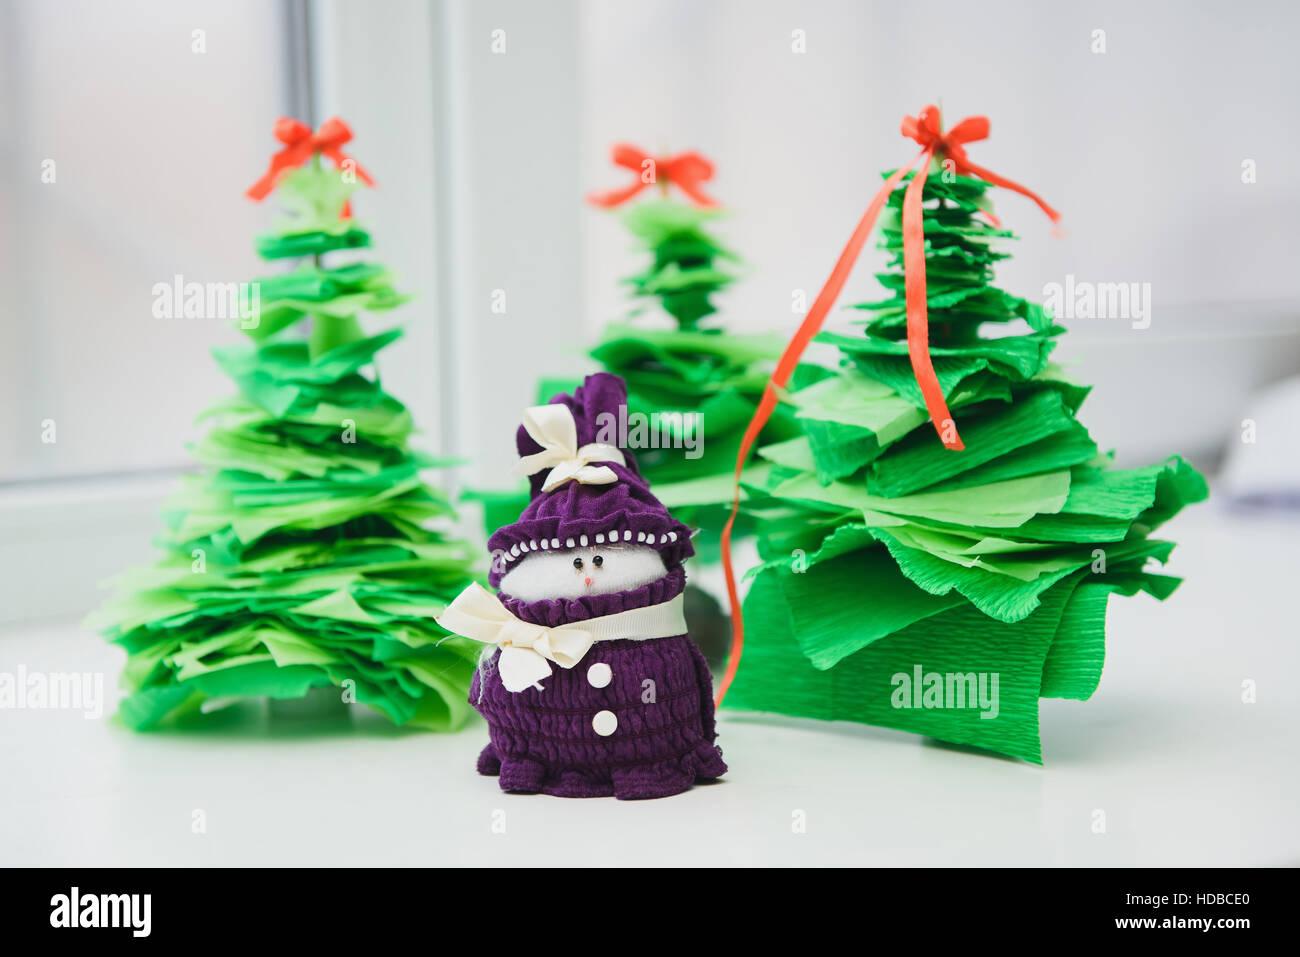 Christmas Handicrafts Christmas Decoration Snowman On White Stock